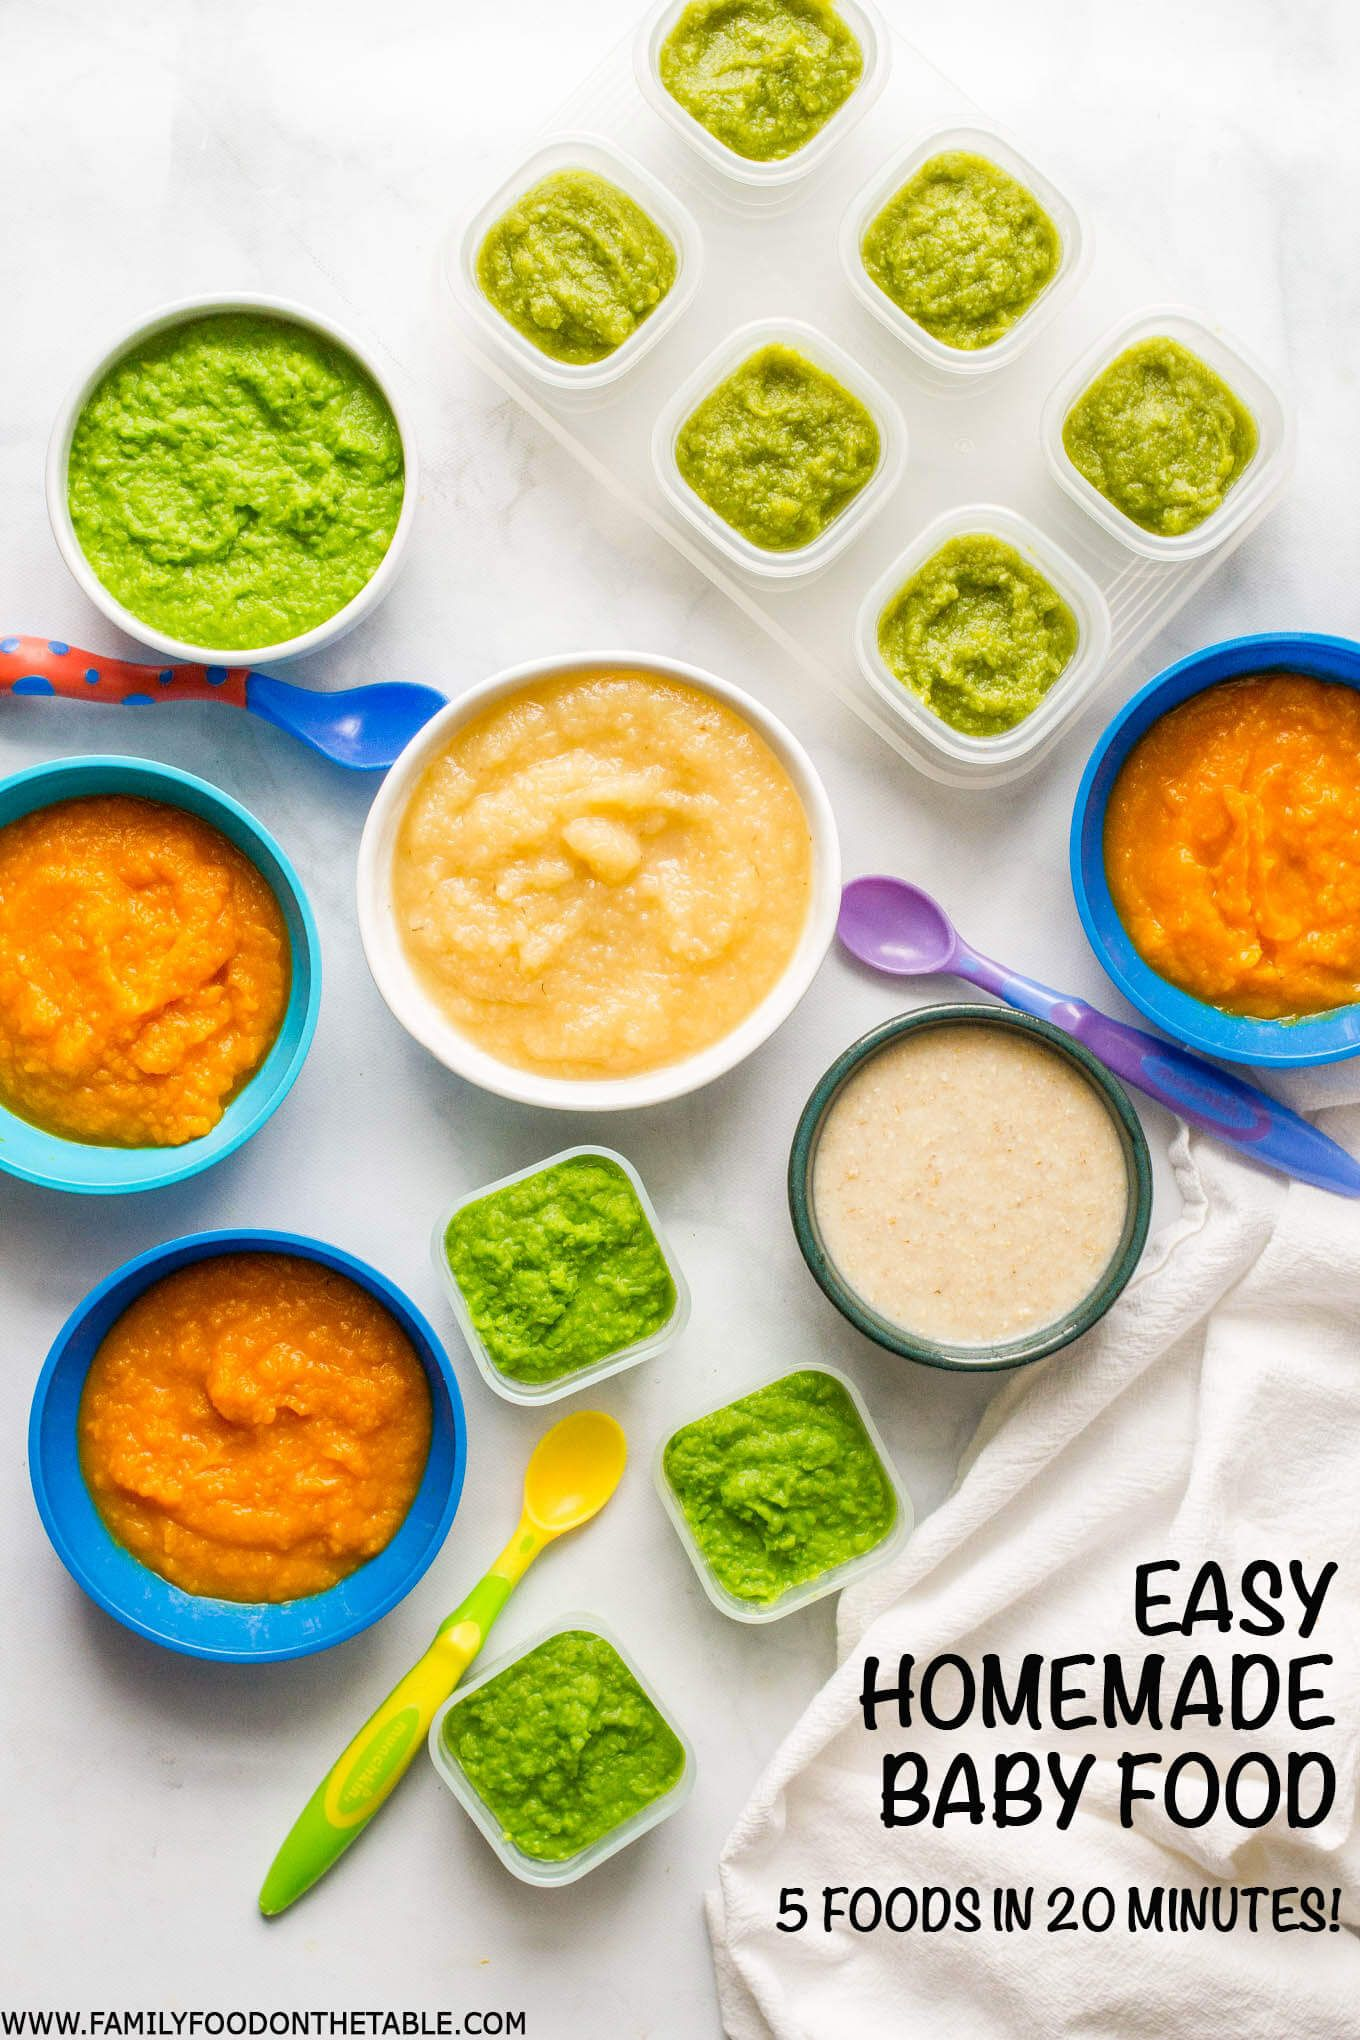 Homemade baby food: Peas, green beans, applesauce ...